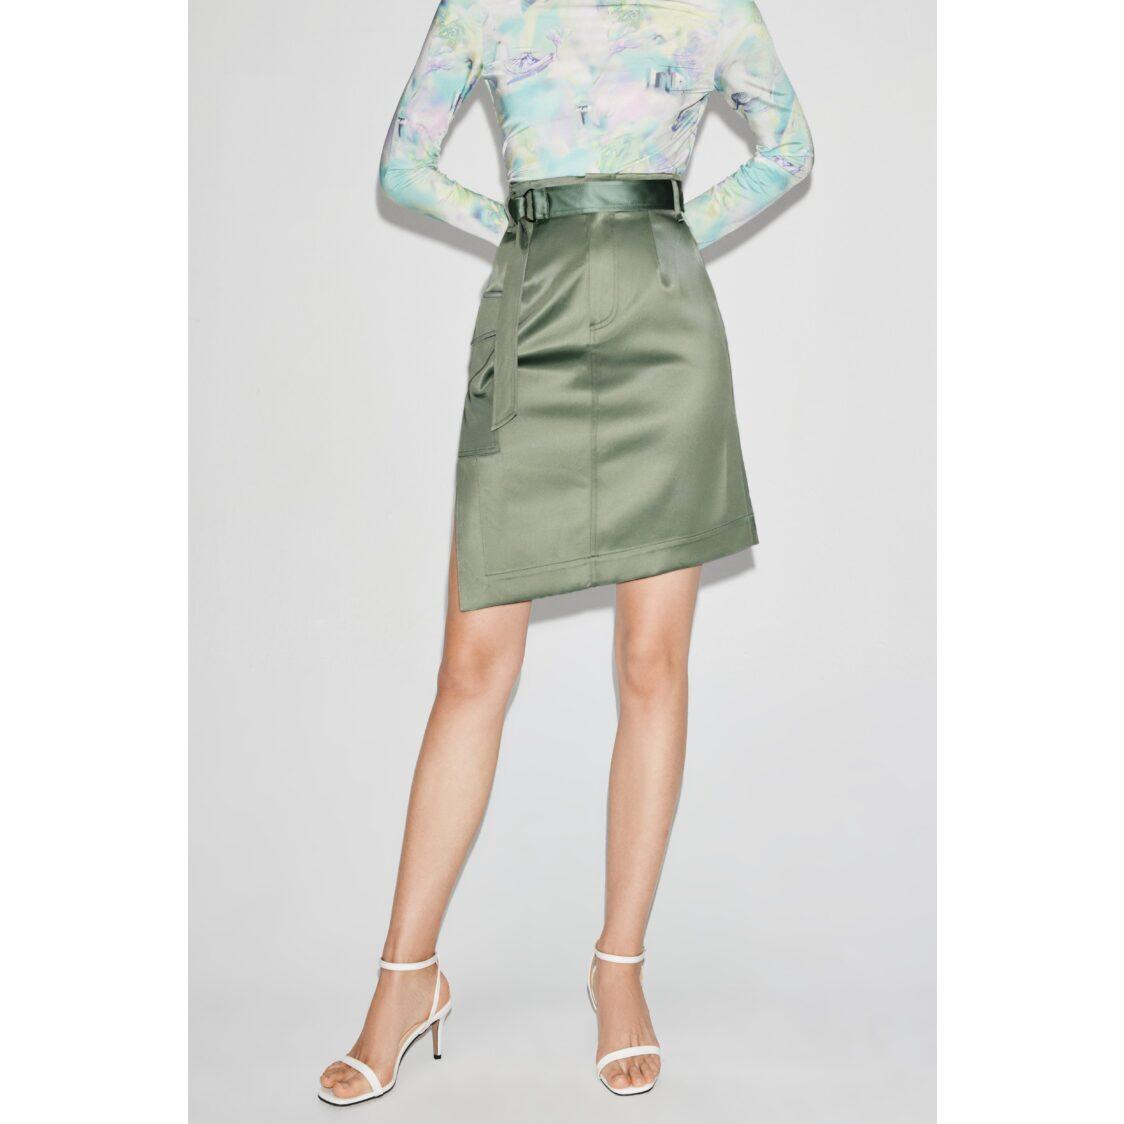 Lily Satin Asymmetric Skirt Sea Pine Green